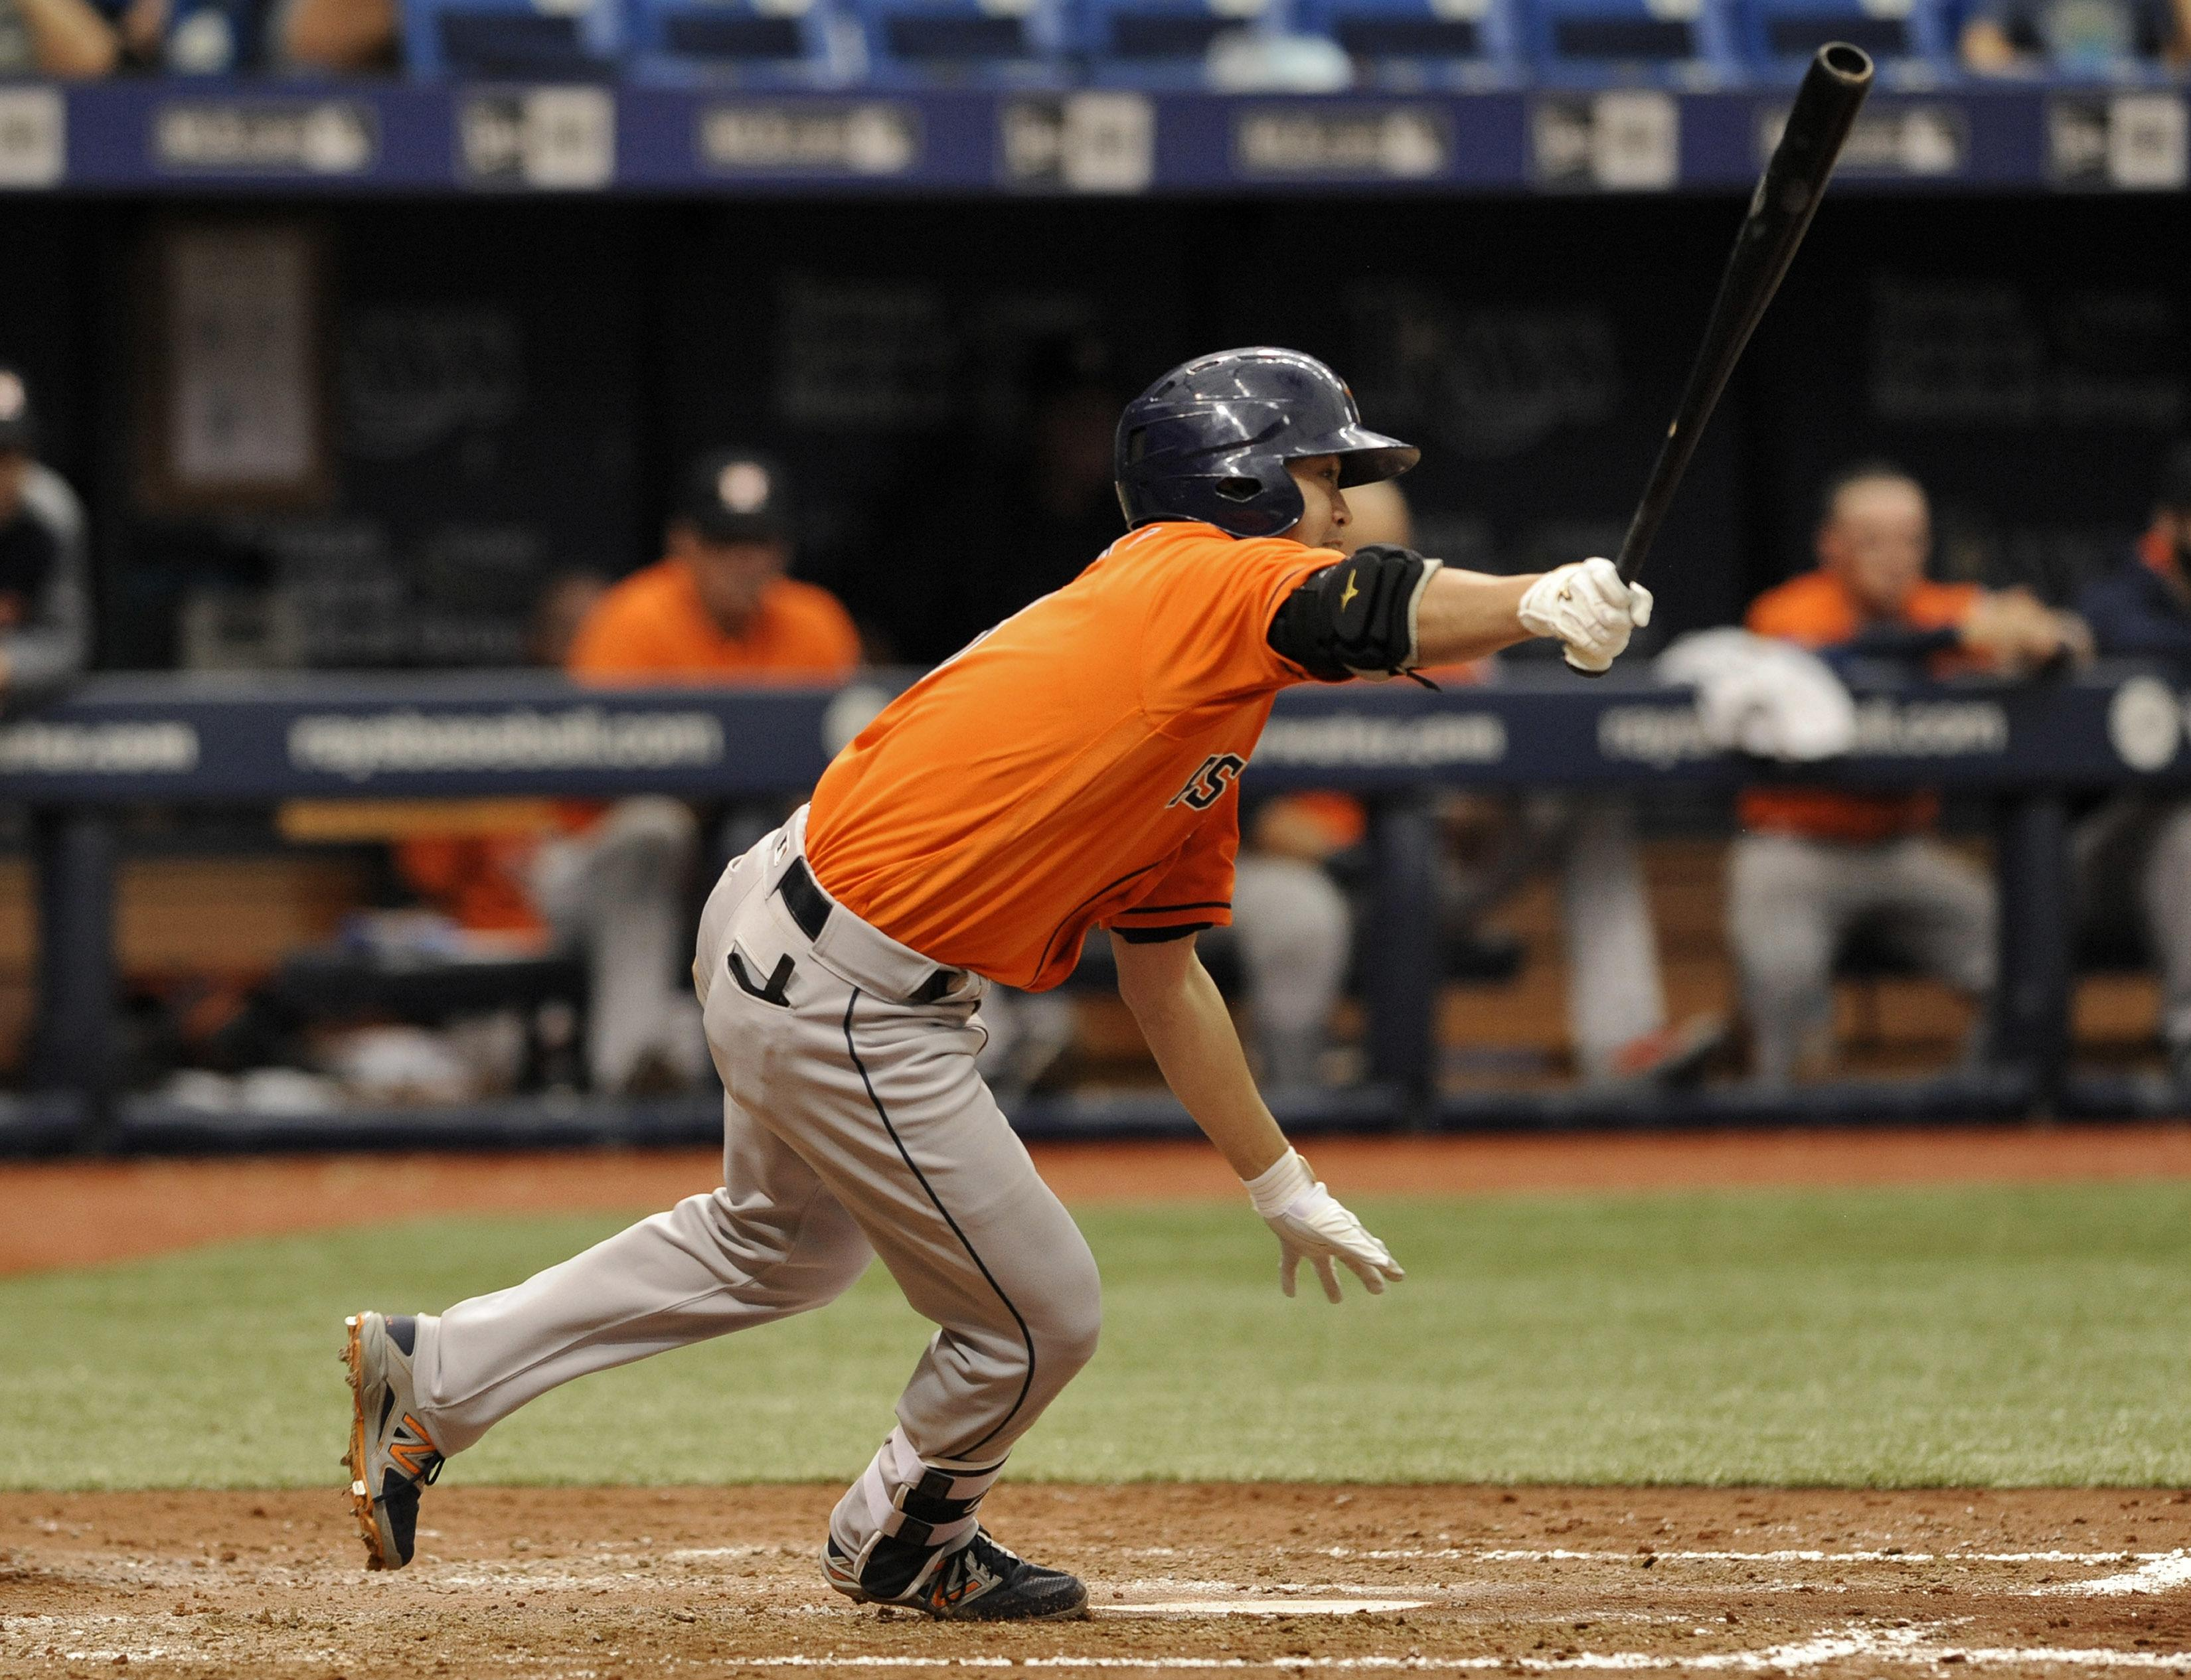 Astros_rays_baseball_72399